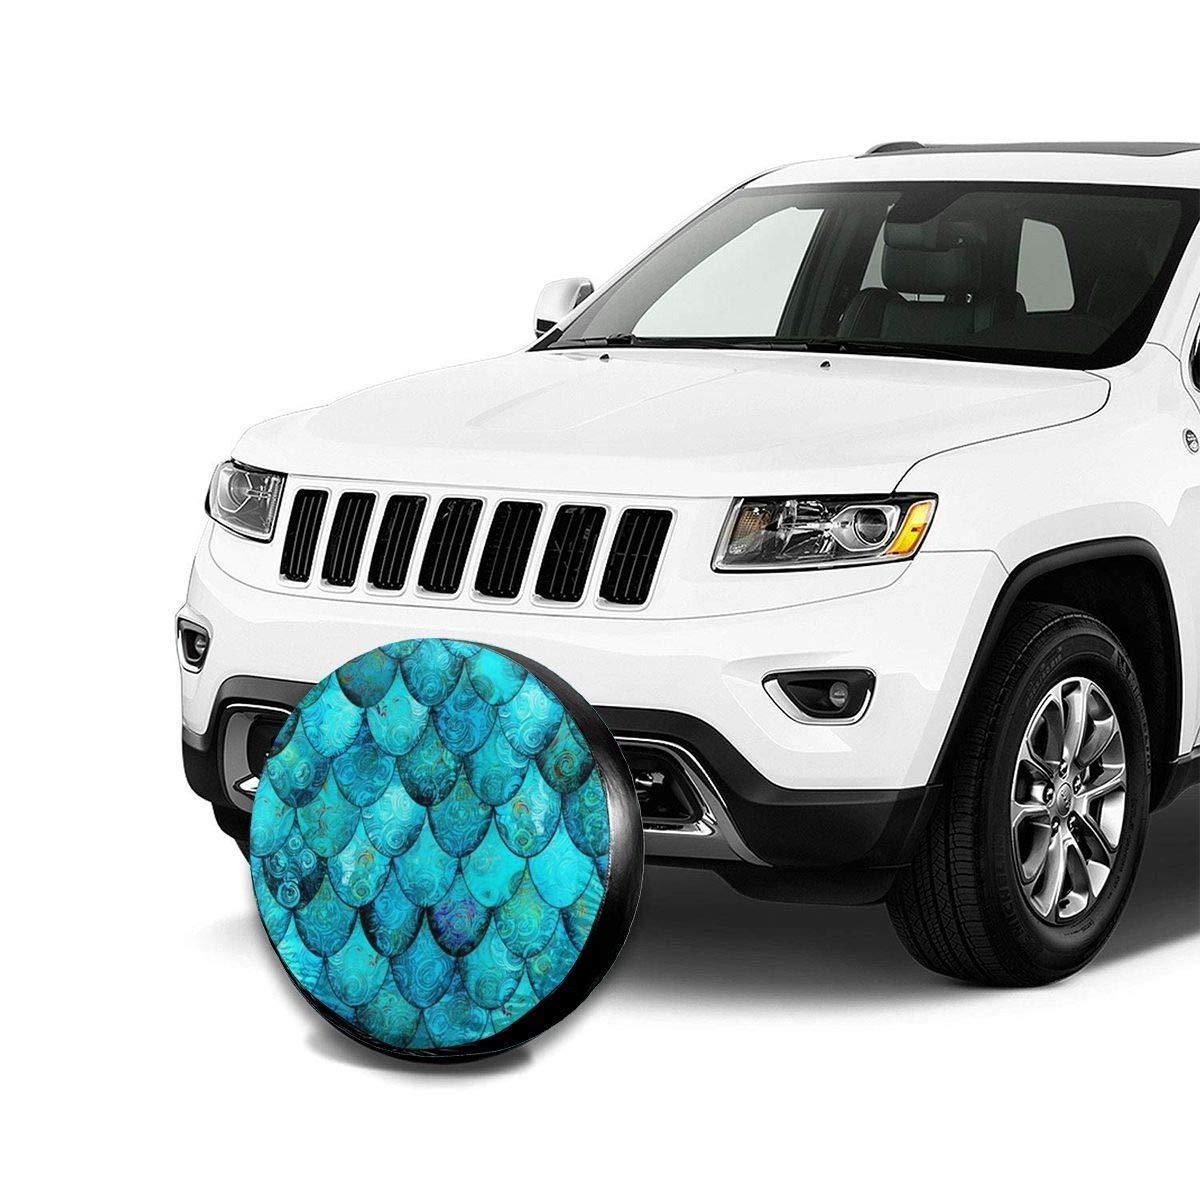 14,15,16,17 Inch Vbnbvn Cubierta de La Rueda de Repuesto Blue Mermaid Potable Polyester Universal Spare Wheel Tire Cover Wheel Covers Jeep Trailer RV SUV Truck Camper Travel Trailer Accessories